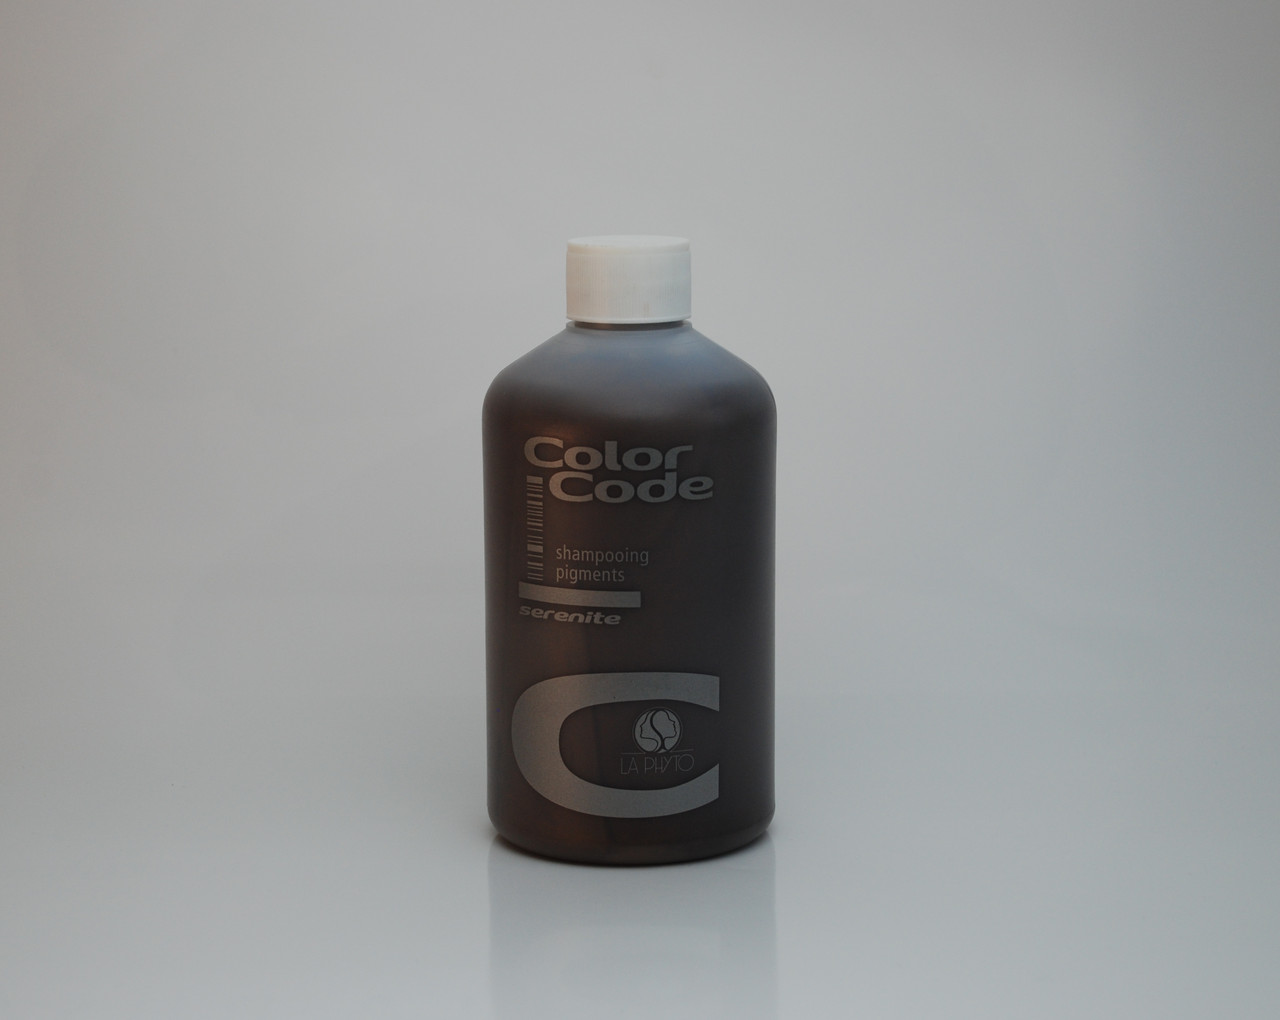 Шампунь тонирующий Коричневый (брюнет) 500мл